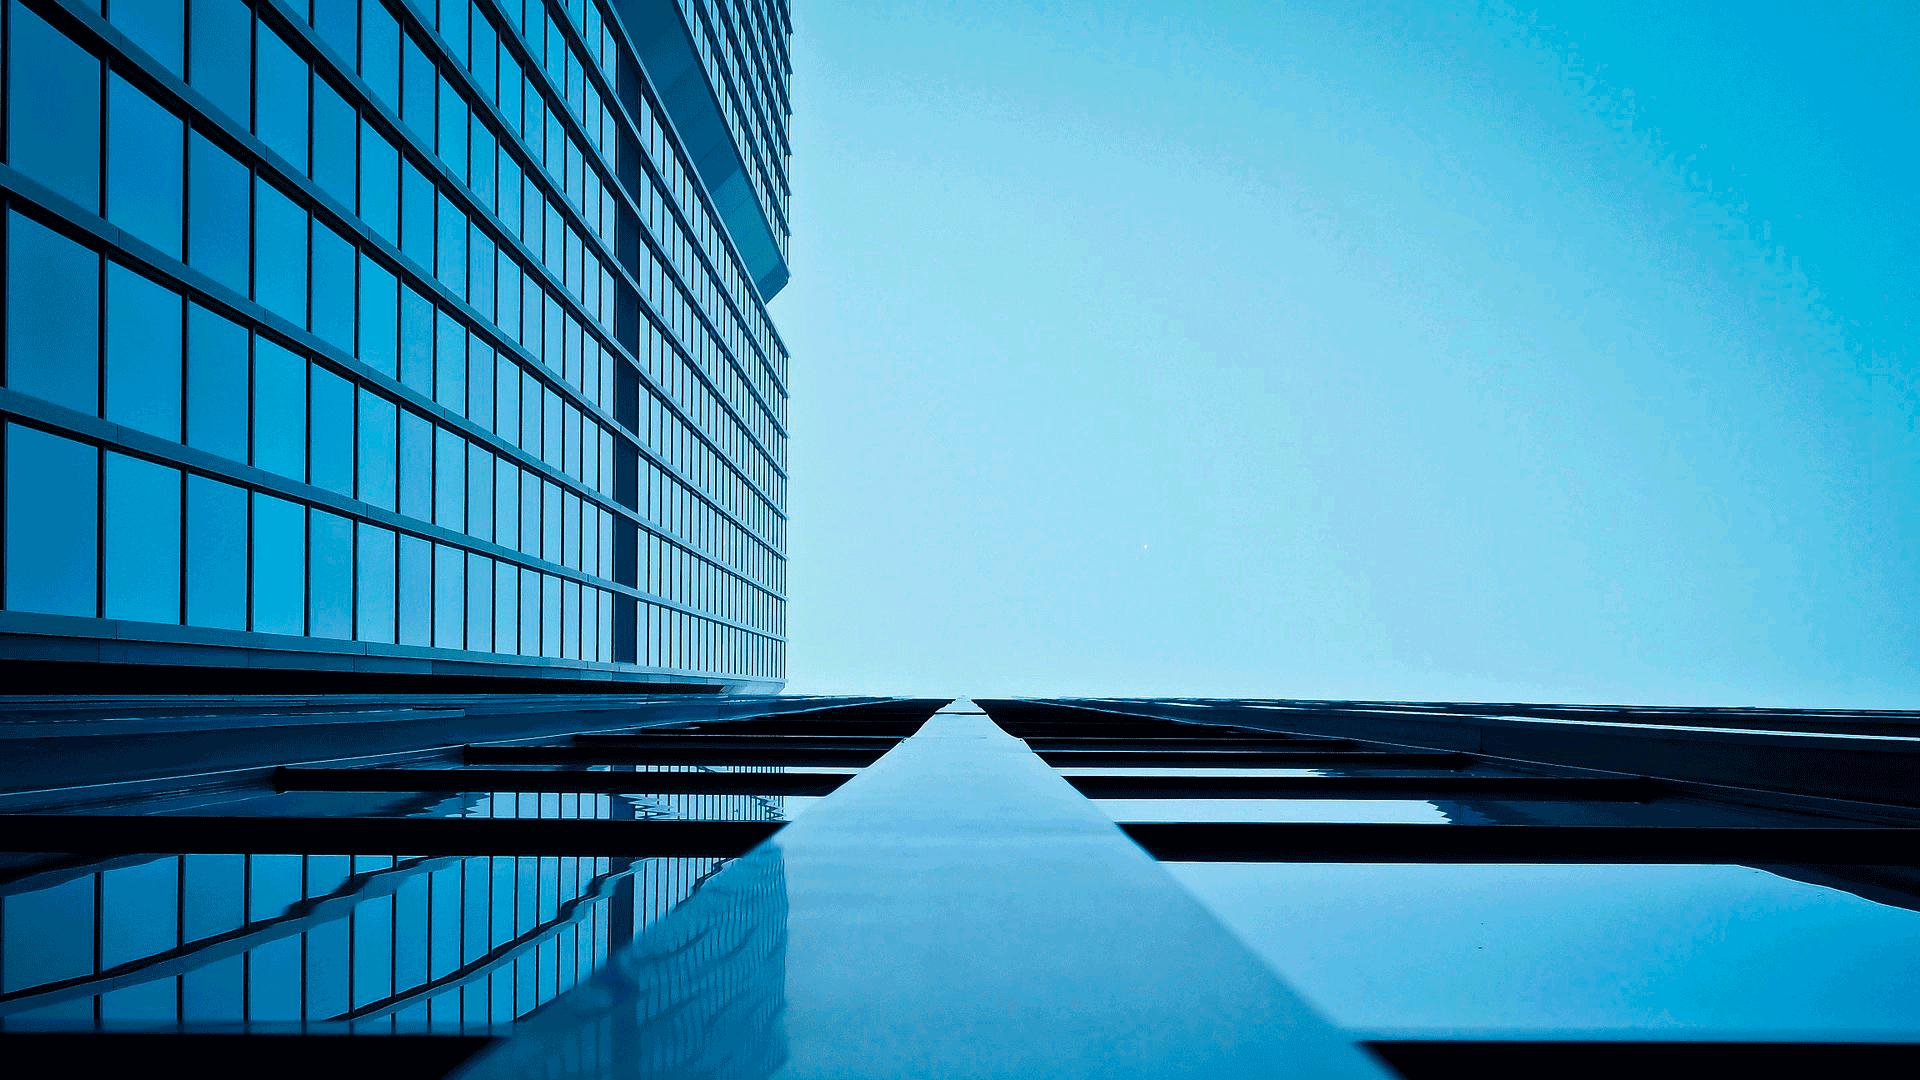 شیشه زاگرس